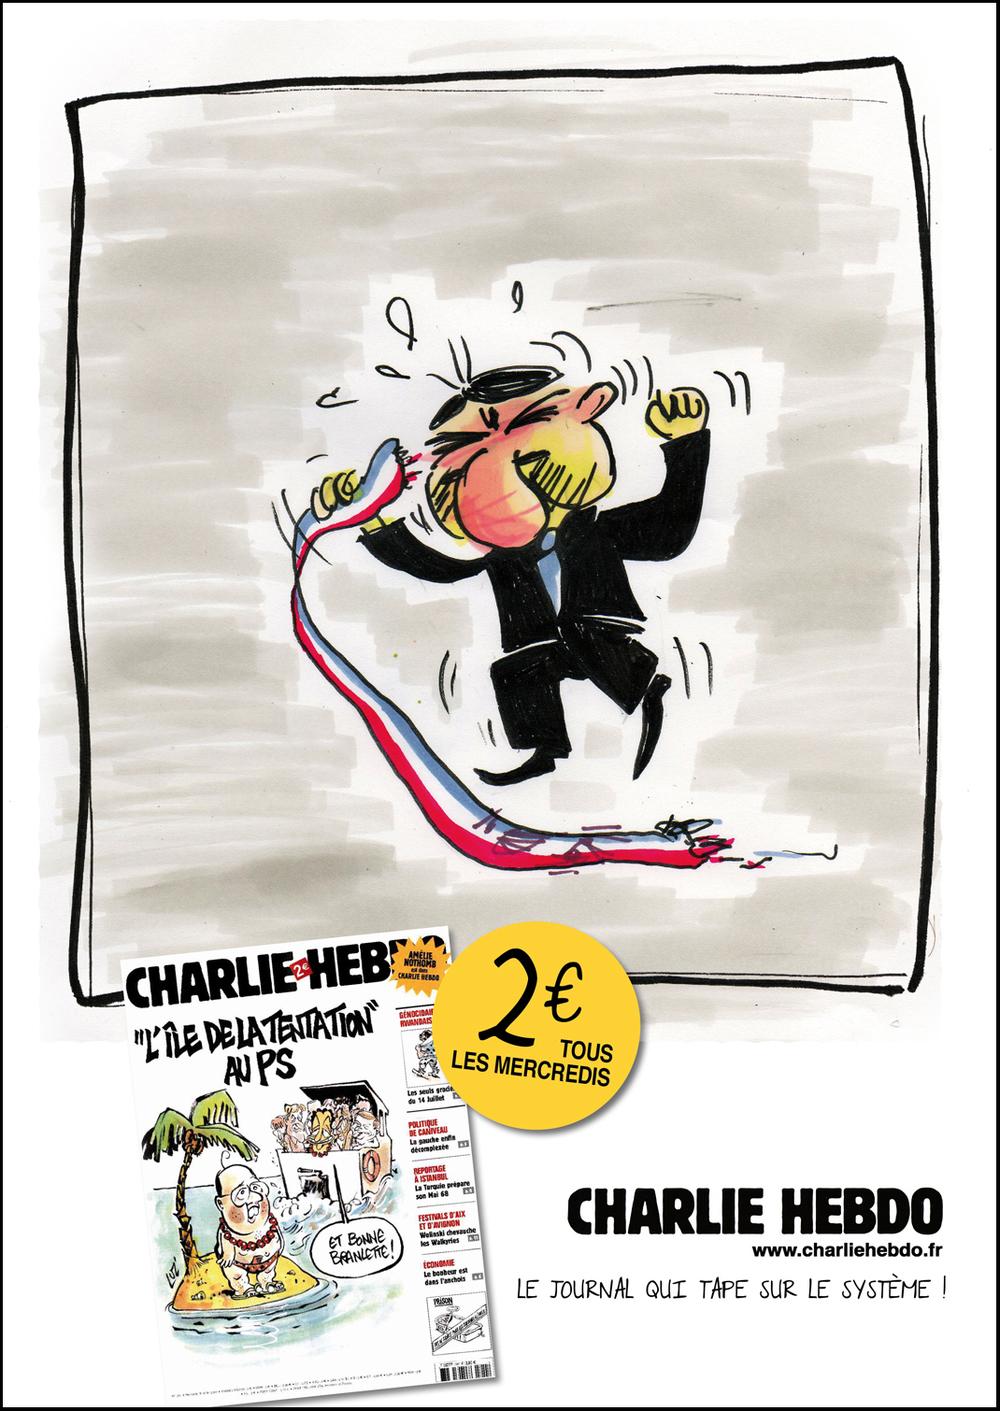 charlie-hebdo-politique-da-lily-la-fronde-redac-simon-erault.jpg